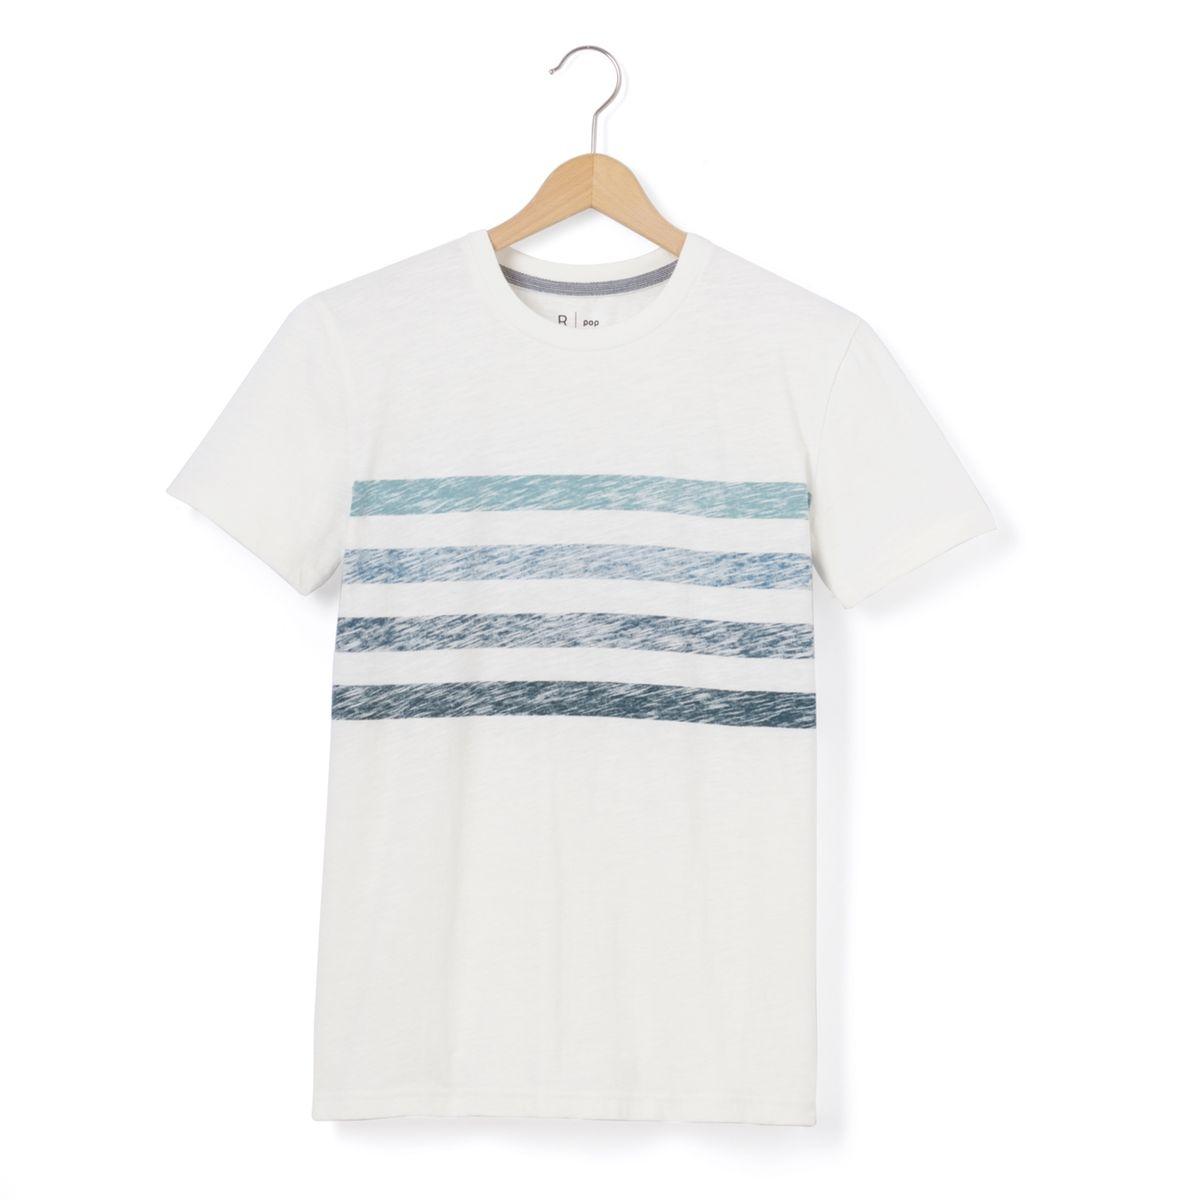 T-shirt rayures placées 10-16 ans